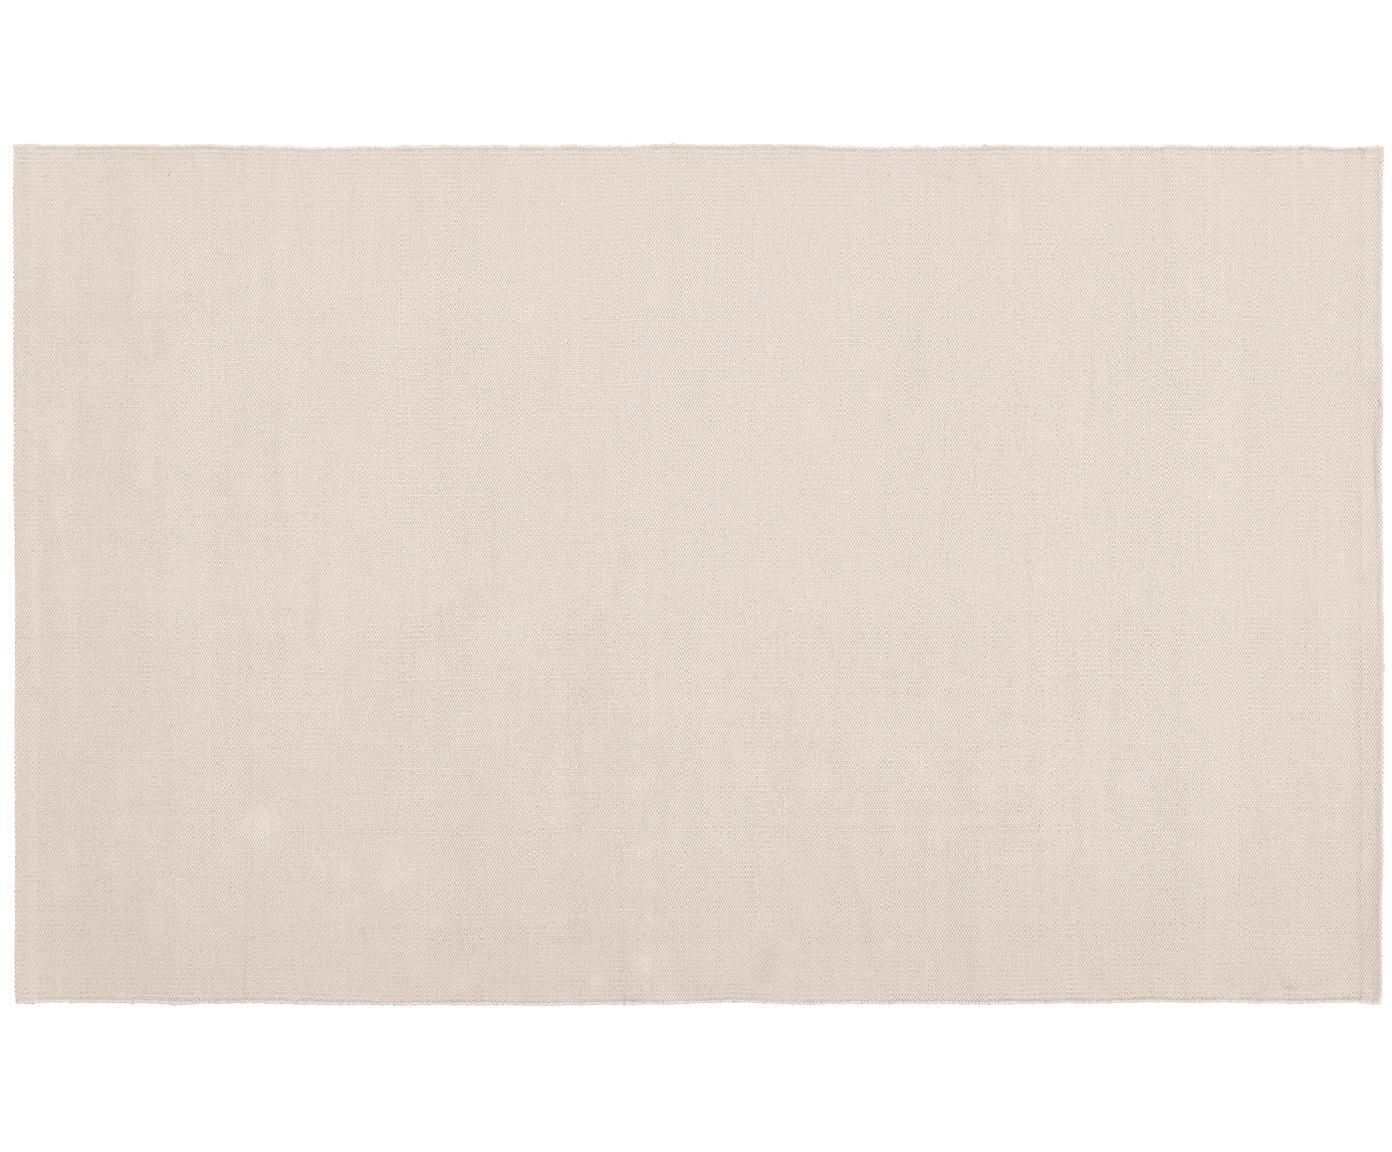 Tappeto in cotone tessuto a mano Agneta, Cotone, Taupe, Larg. 50 x Lung. 80 cm (taglia XXS)